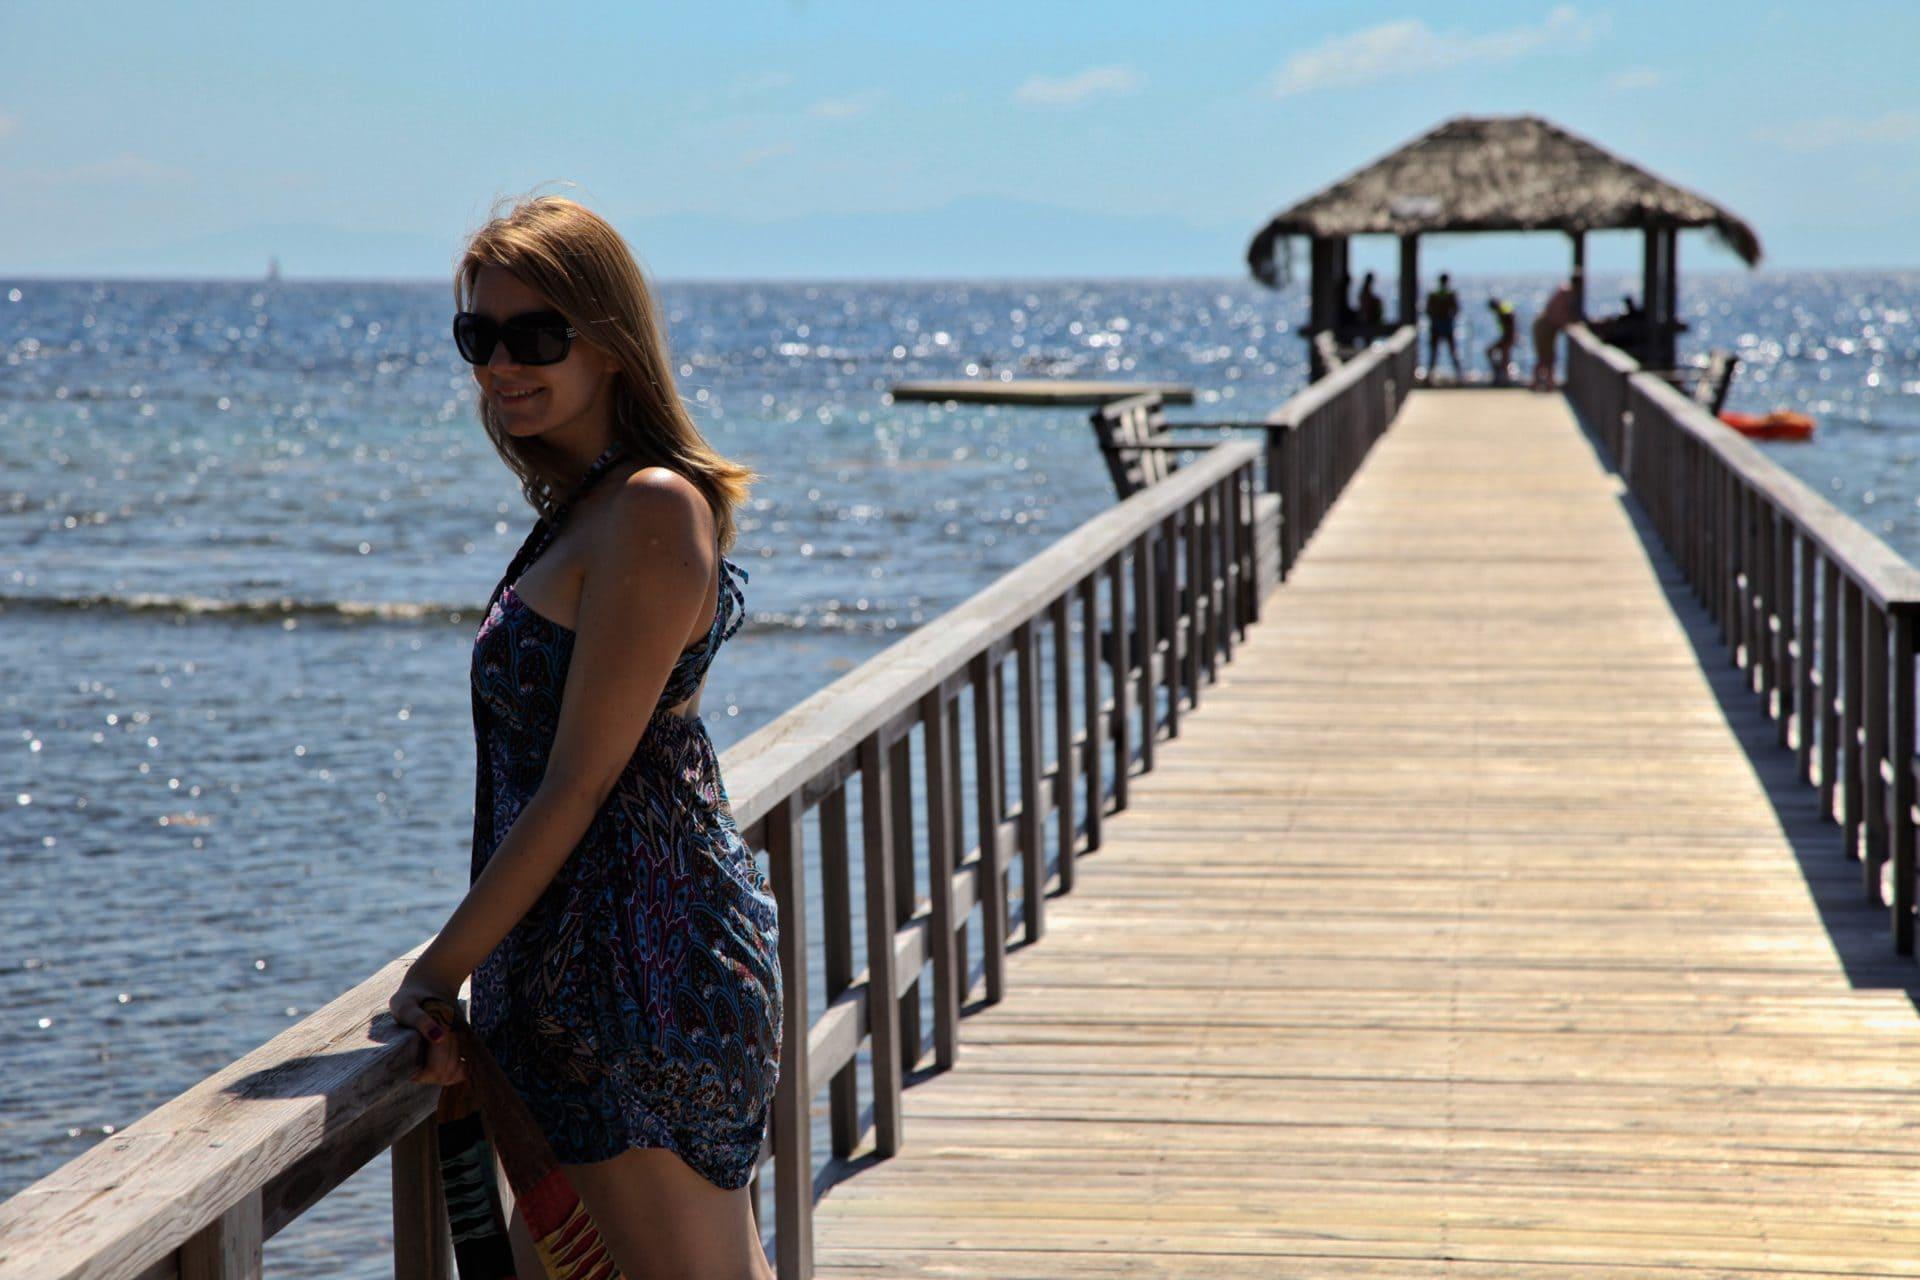 Roatán, Honduras - Experiencing the Globe